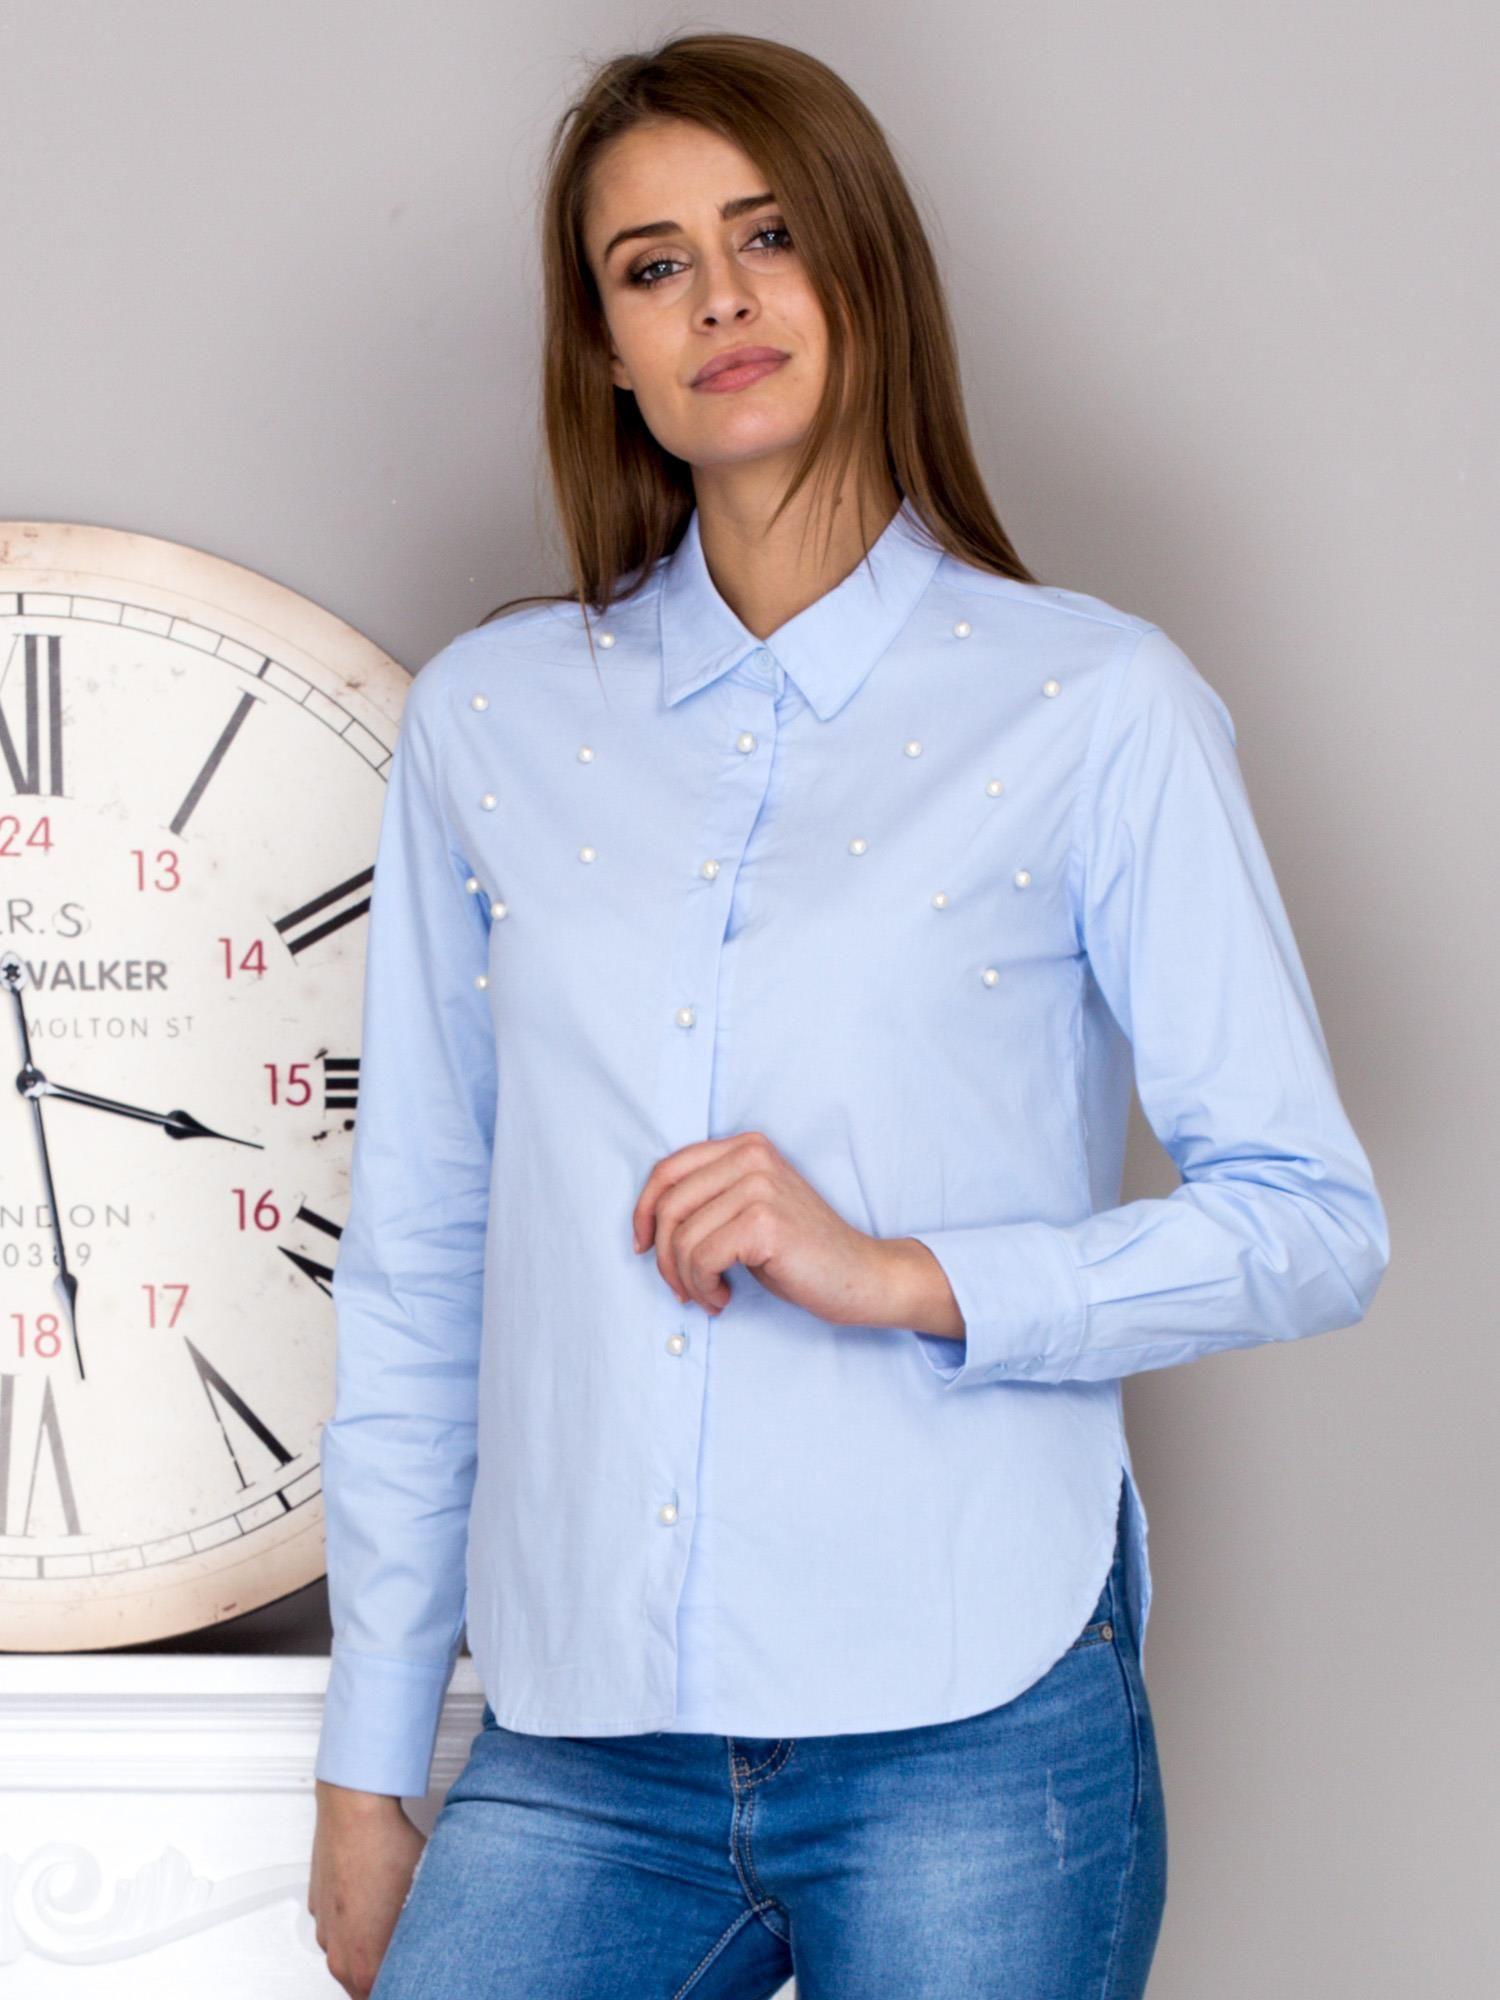 f3a15ad98310 Koszula damska z perełkami niebieska - Koszula z perełkami - sklep eButik.pl